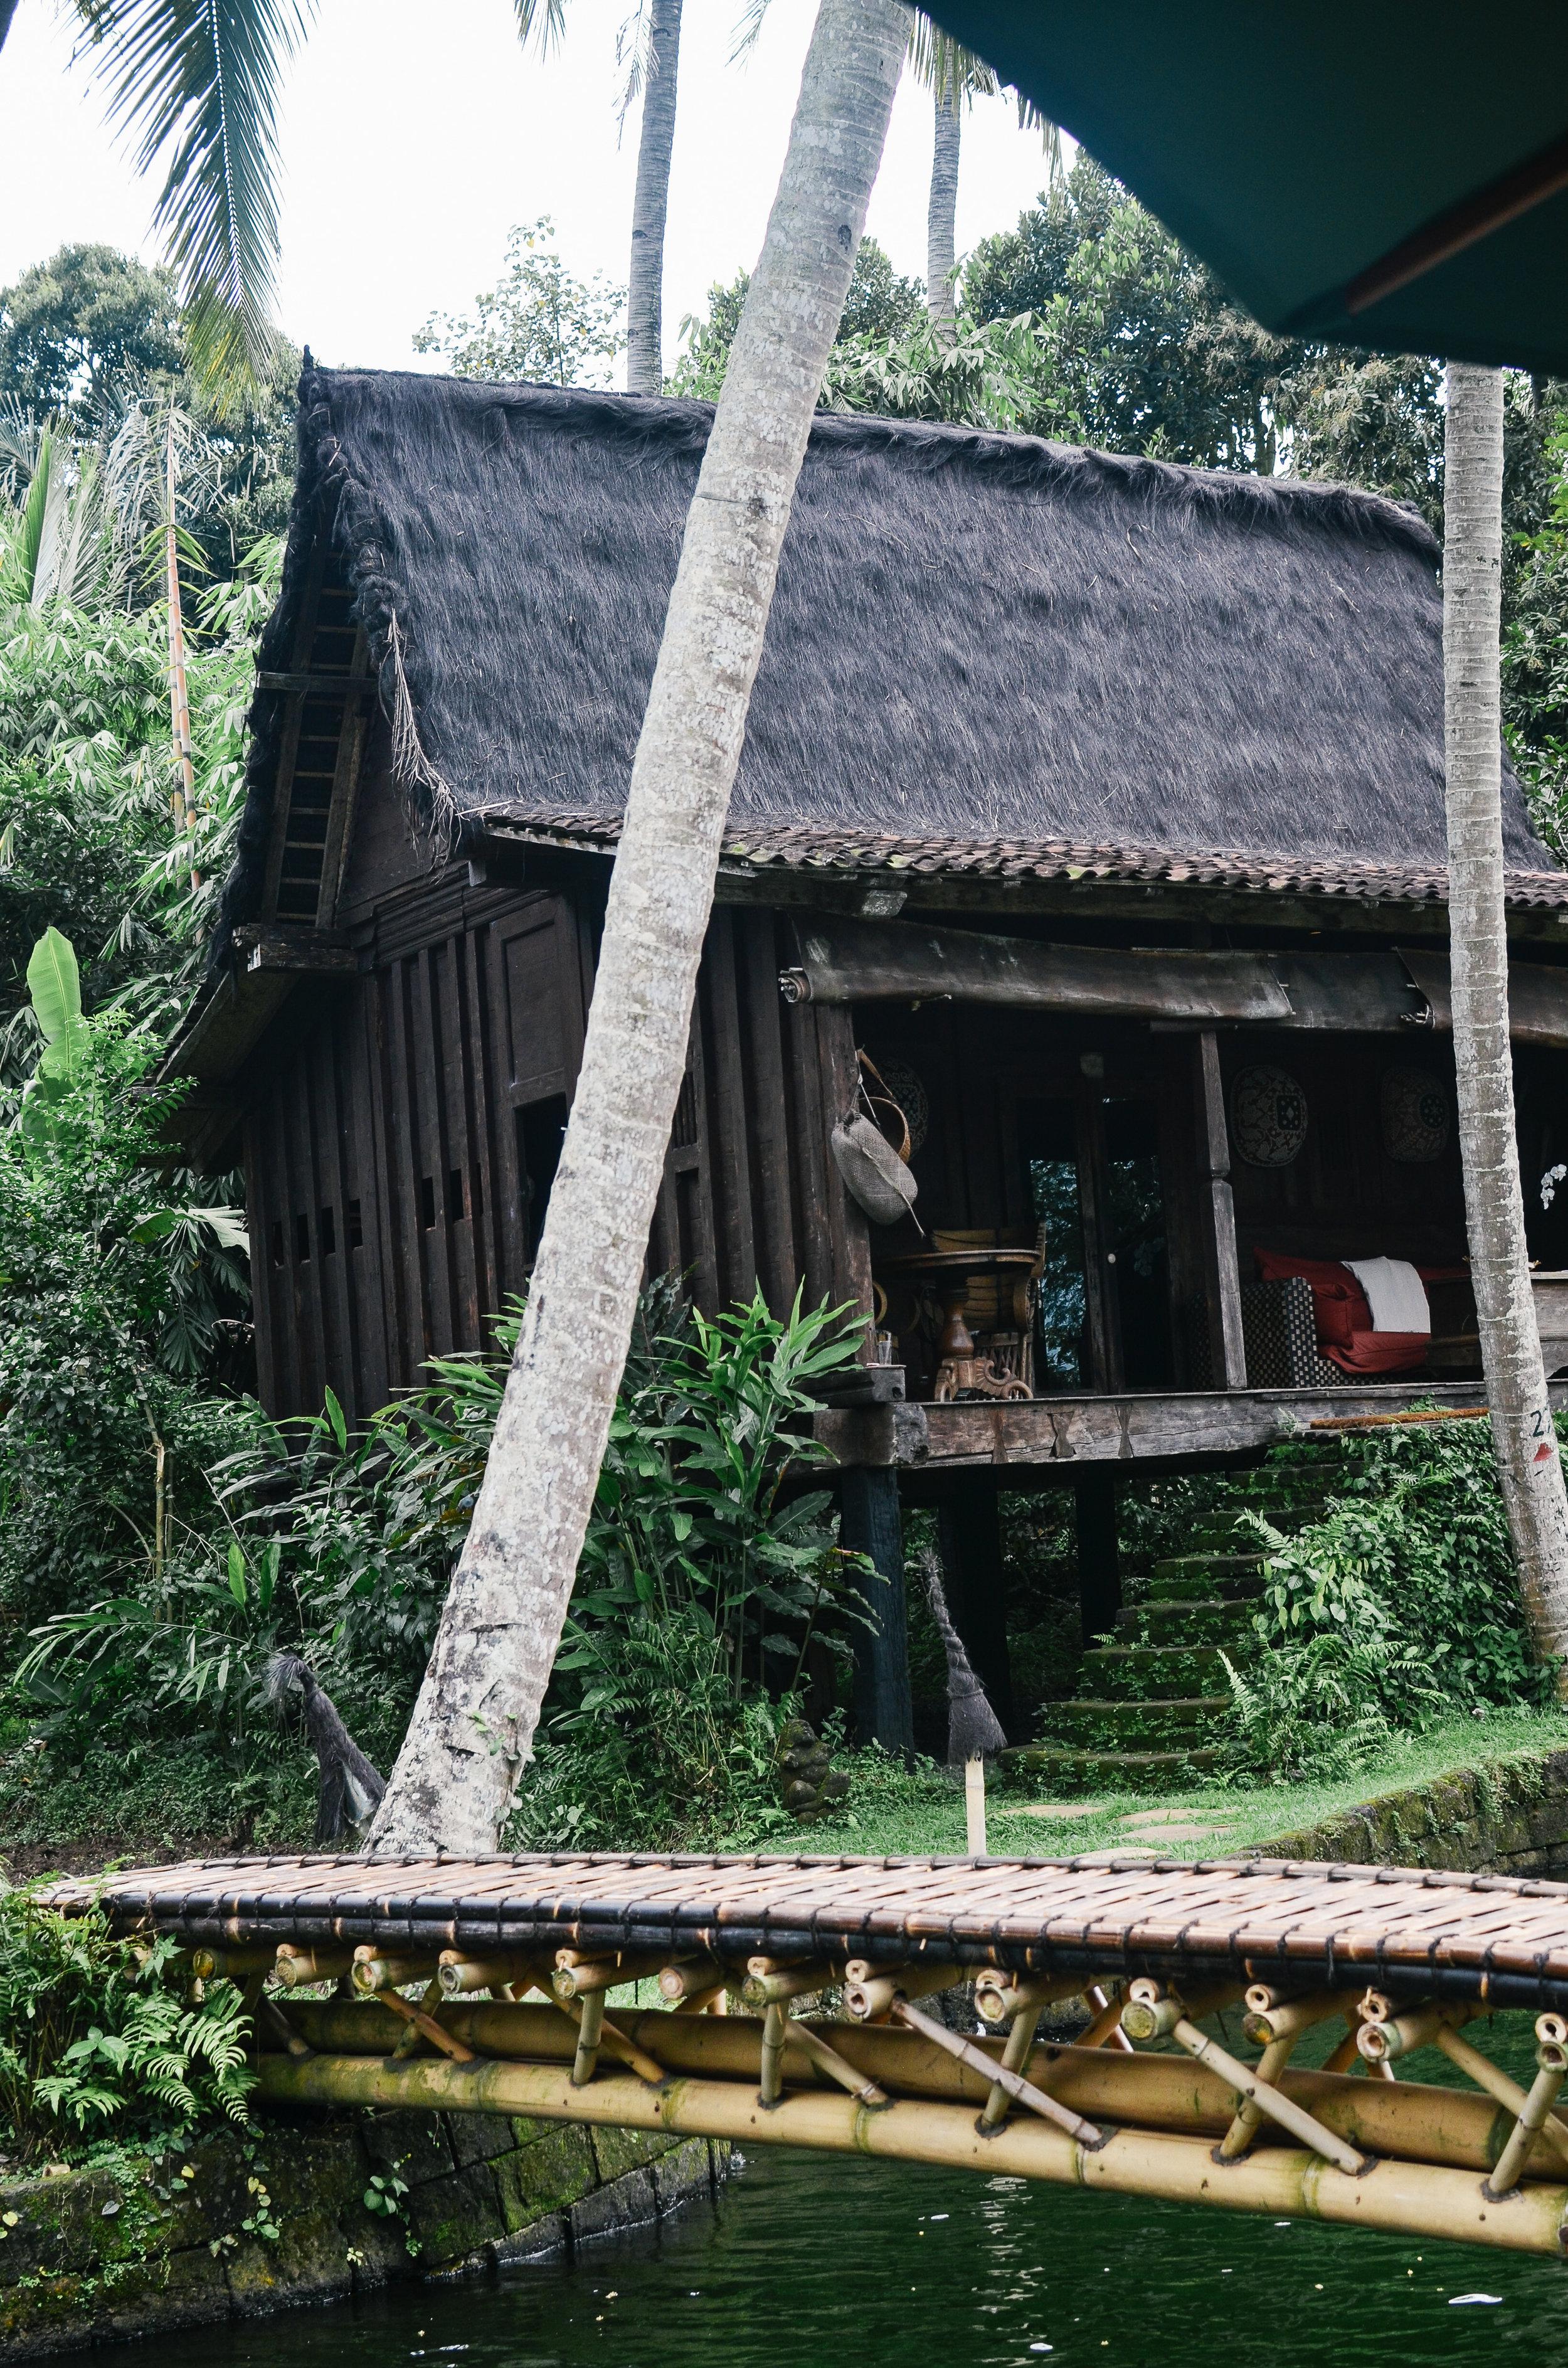 bali+mosca+bamboo+lodge+bali+ubud+lifeonpine_DSC_2874.jpg